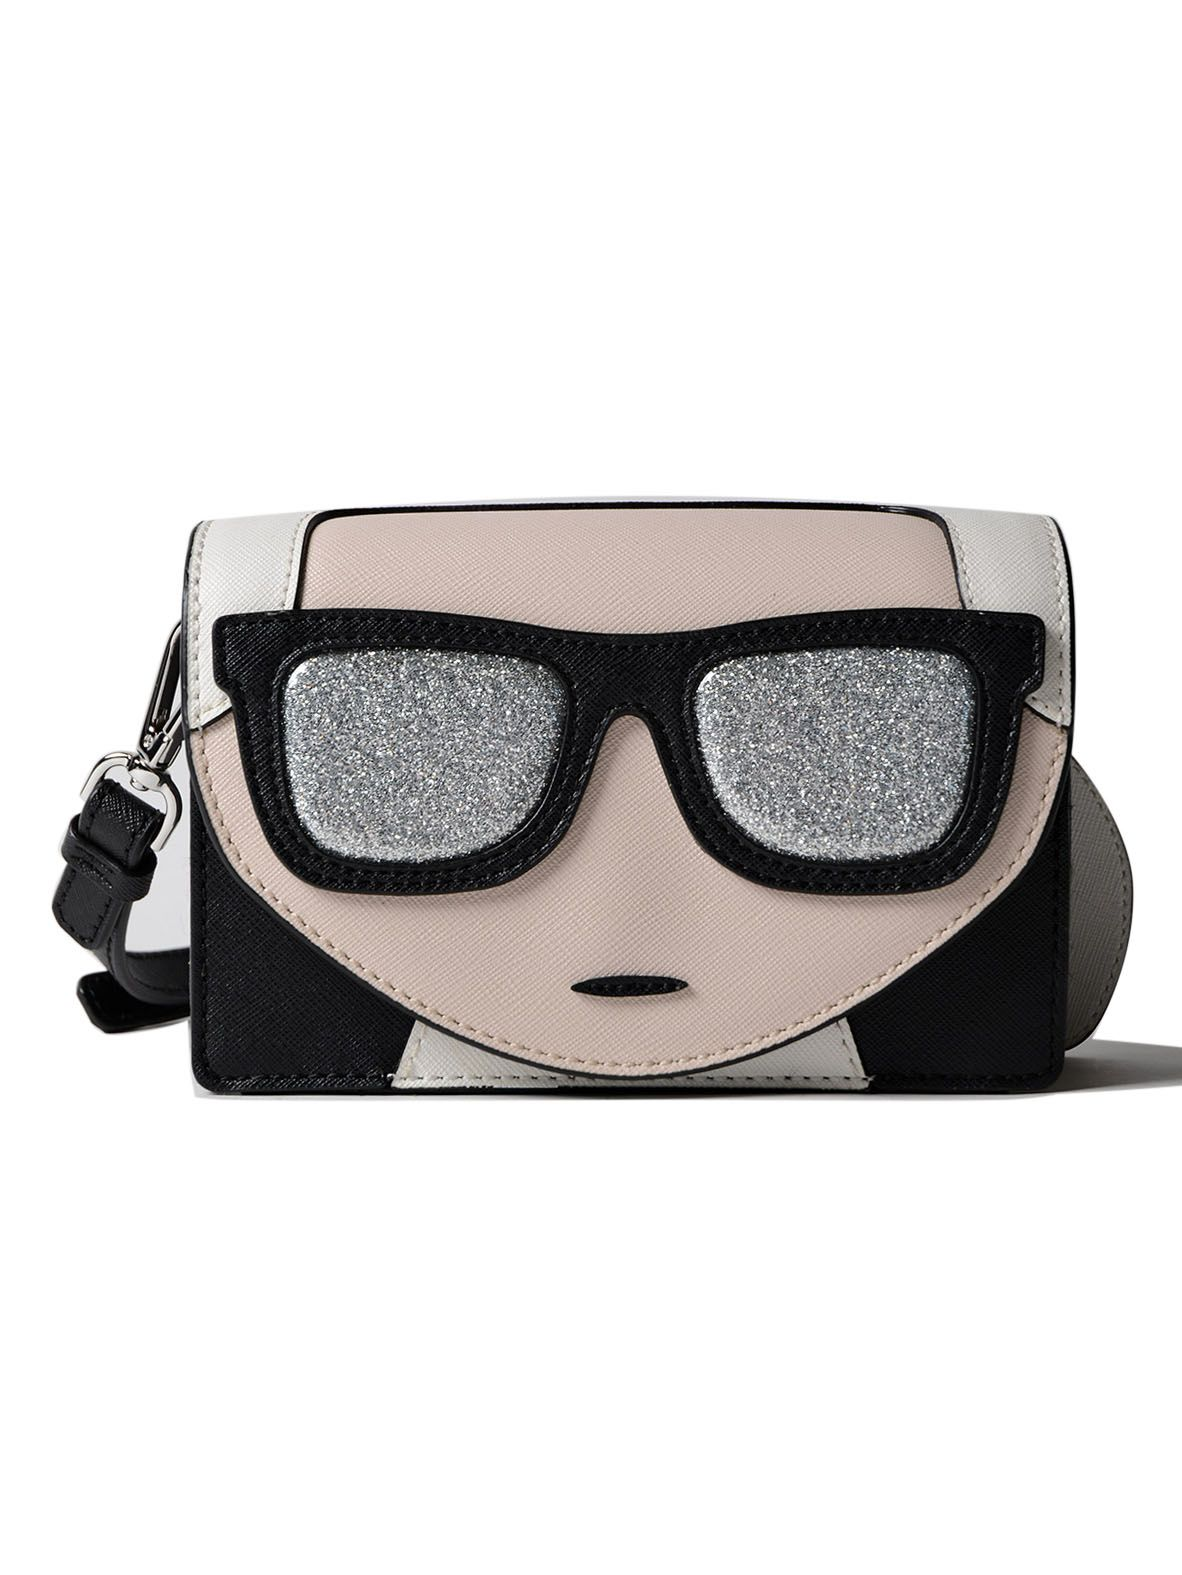 Karl Lagerfeld Mini Crossbody Bag